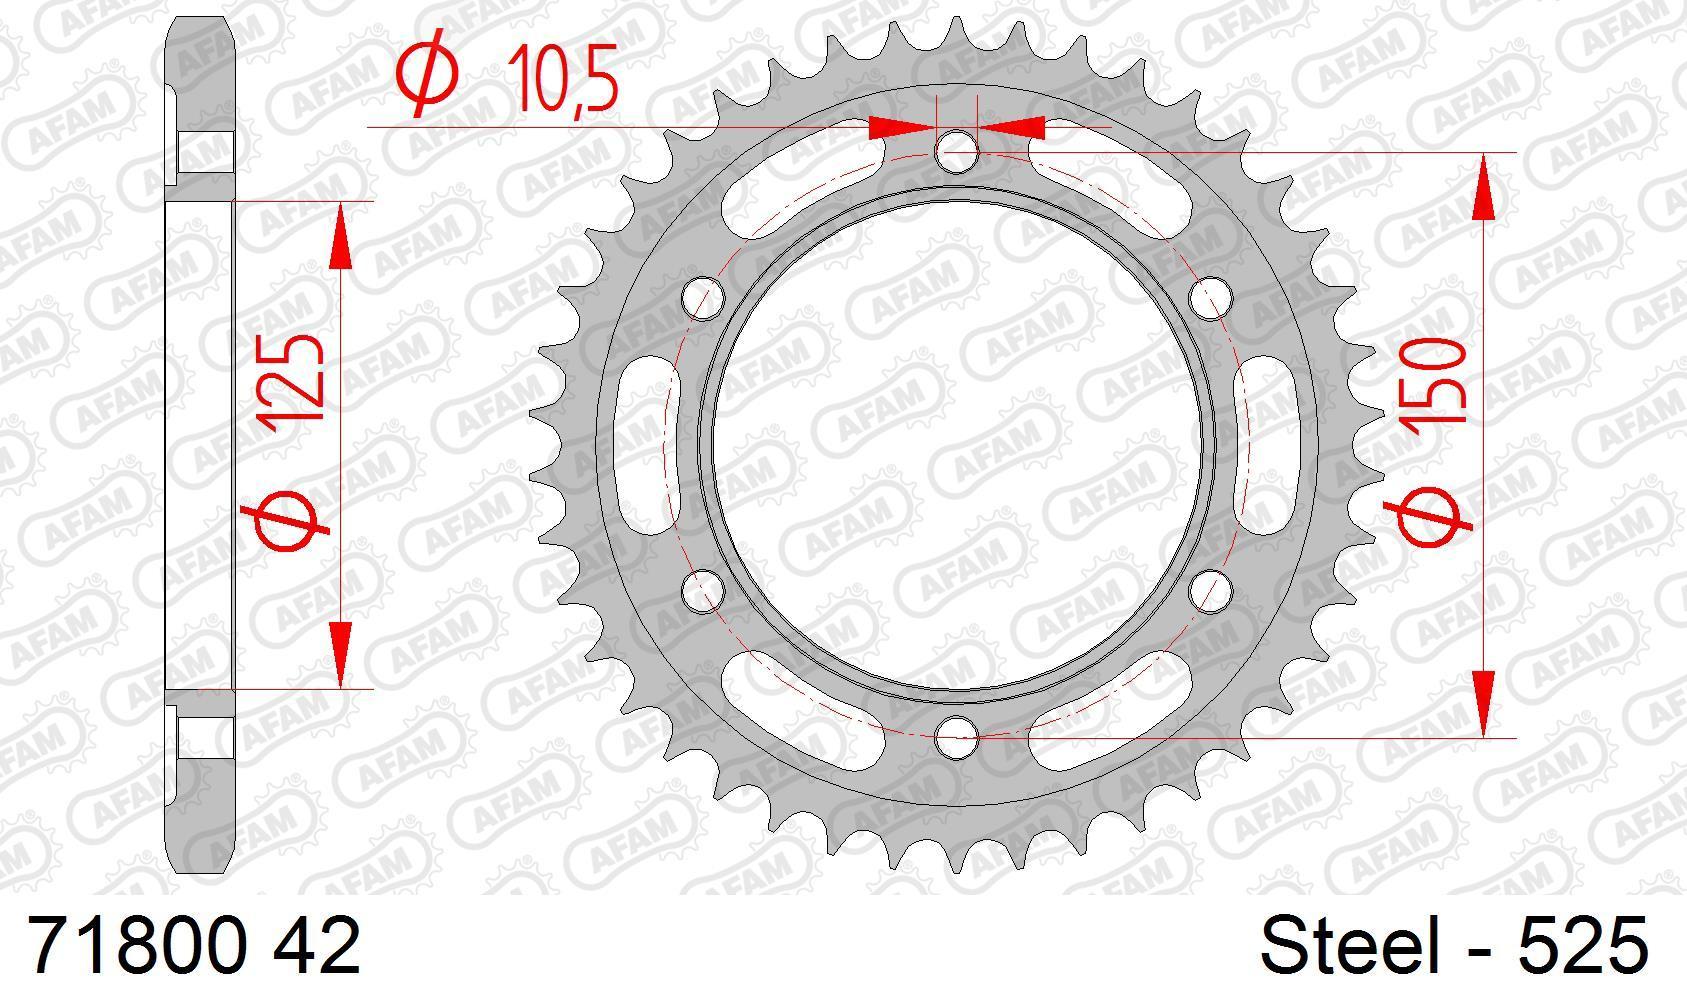 Motorrad Kettenrad 71800-42 Niedrige Preise - Jetzt kaufen!